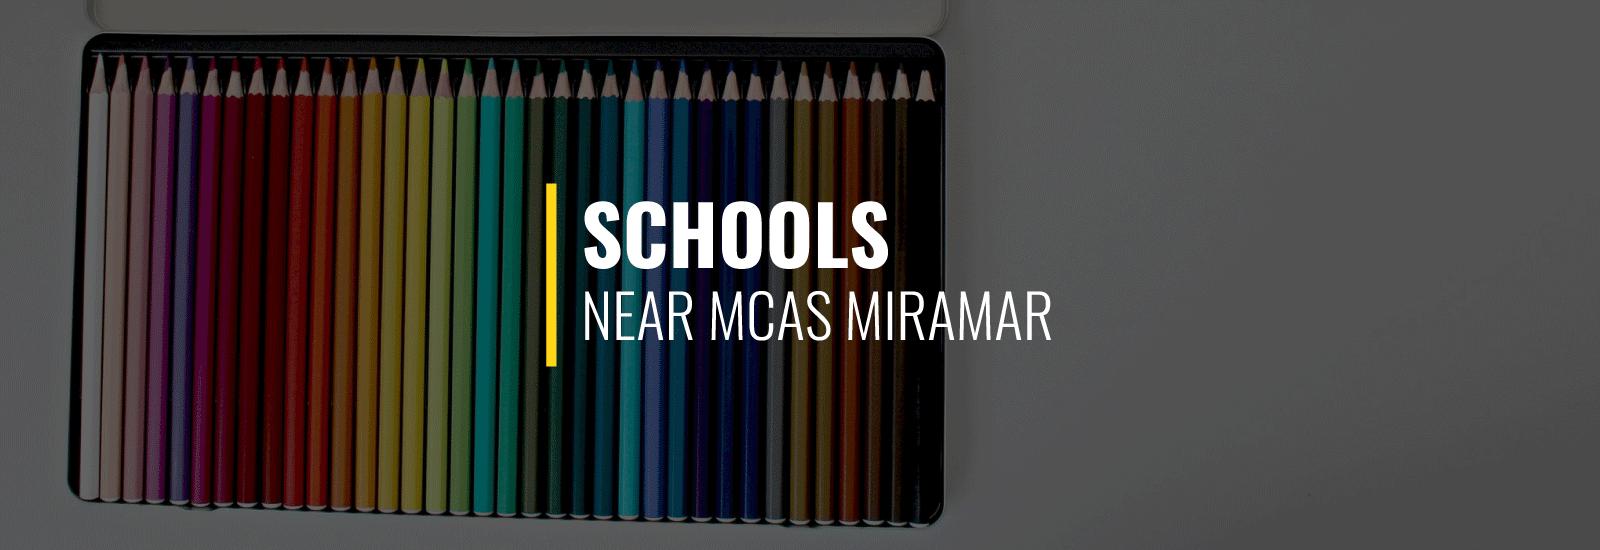 MCAS Miramar Schools